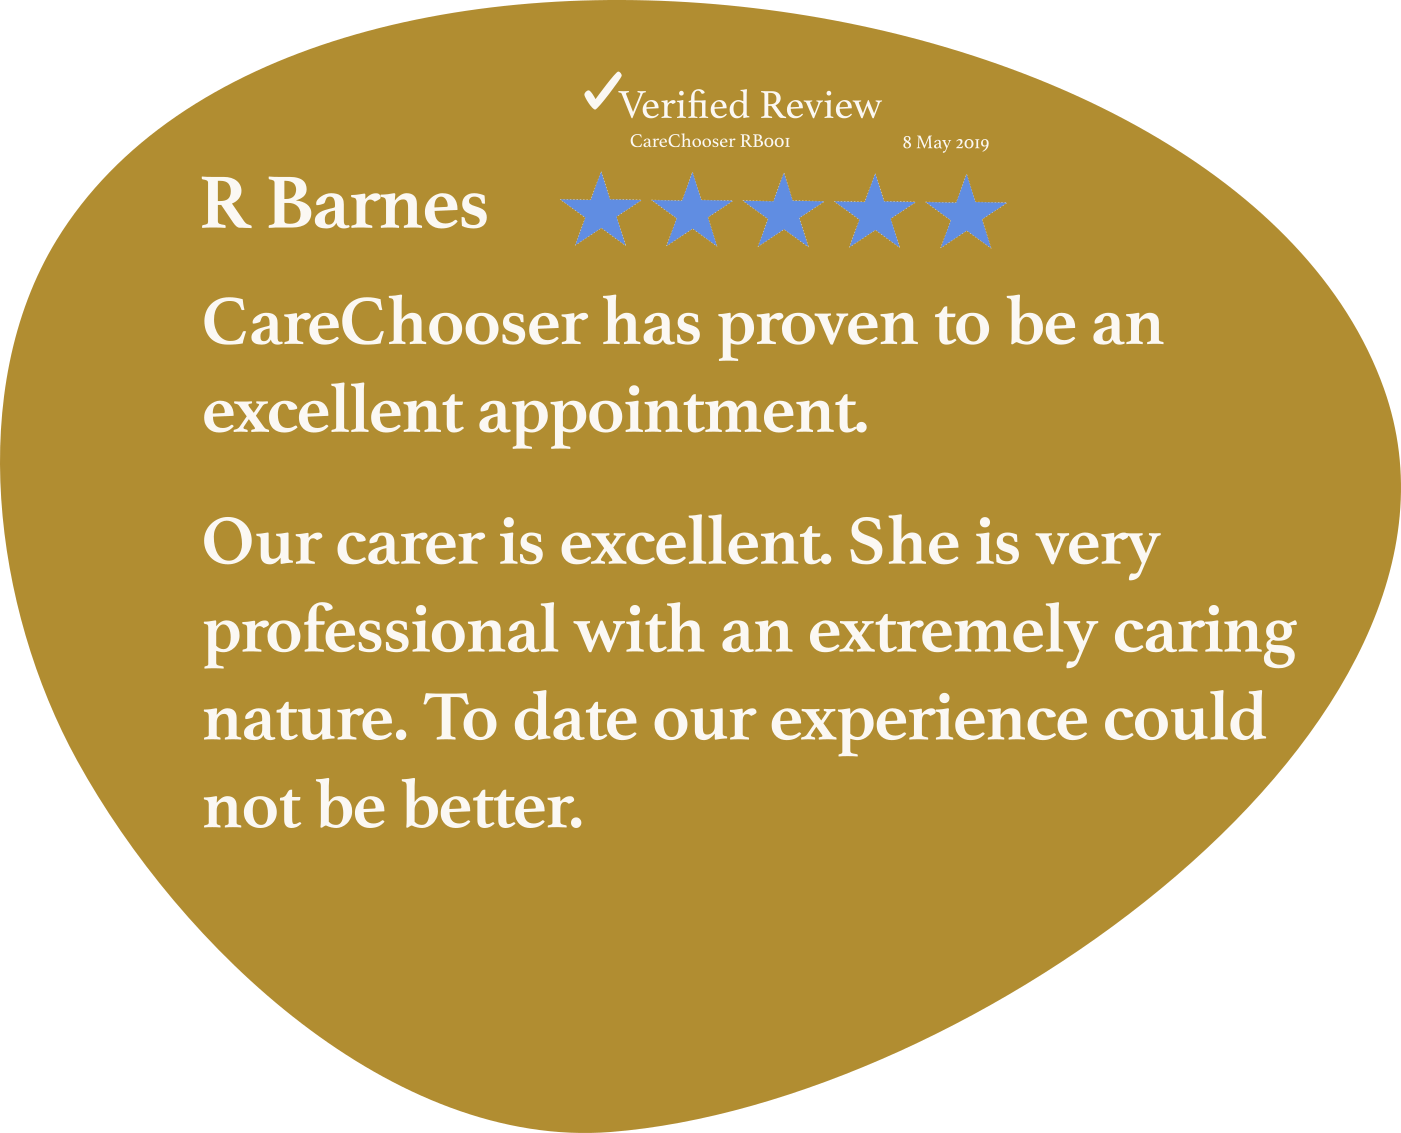 CareChooser home care review - R Barnes3 copy.png